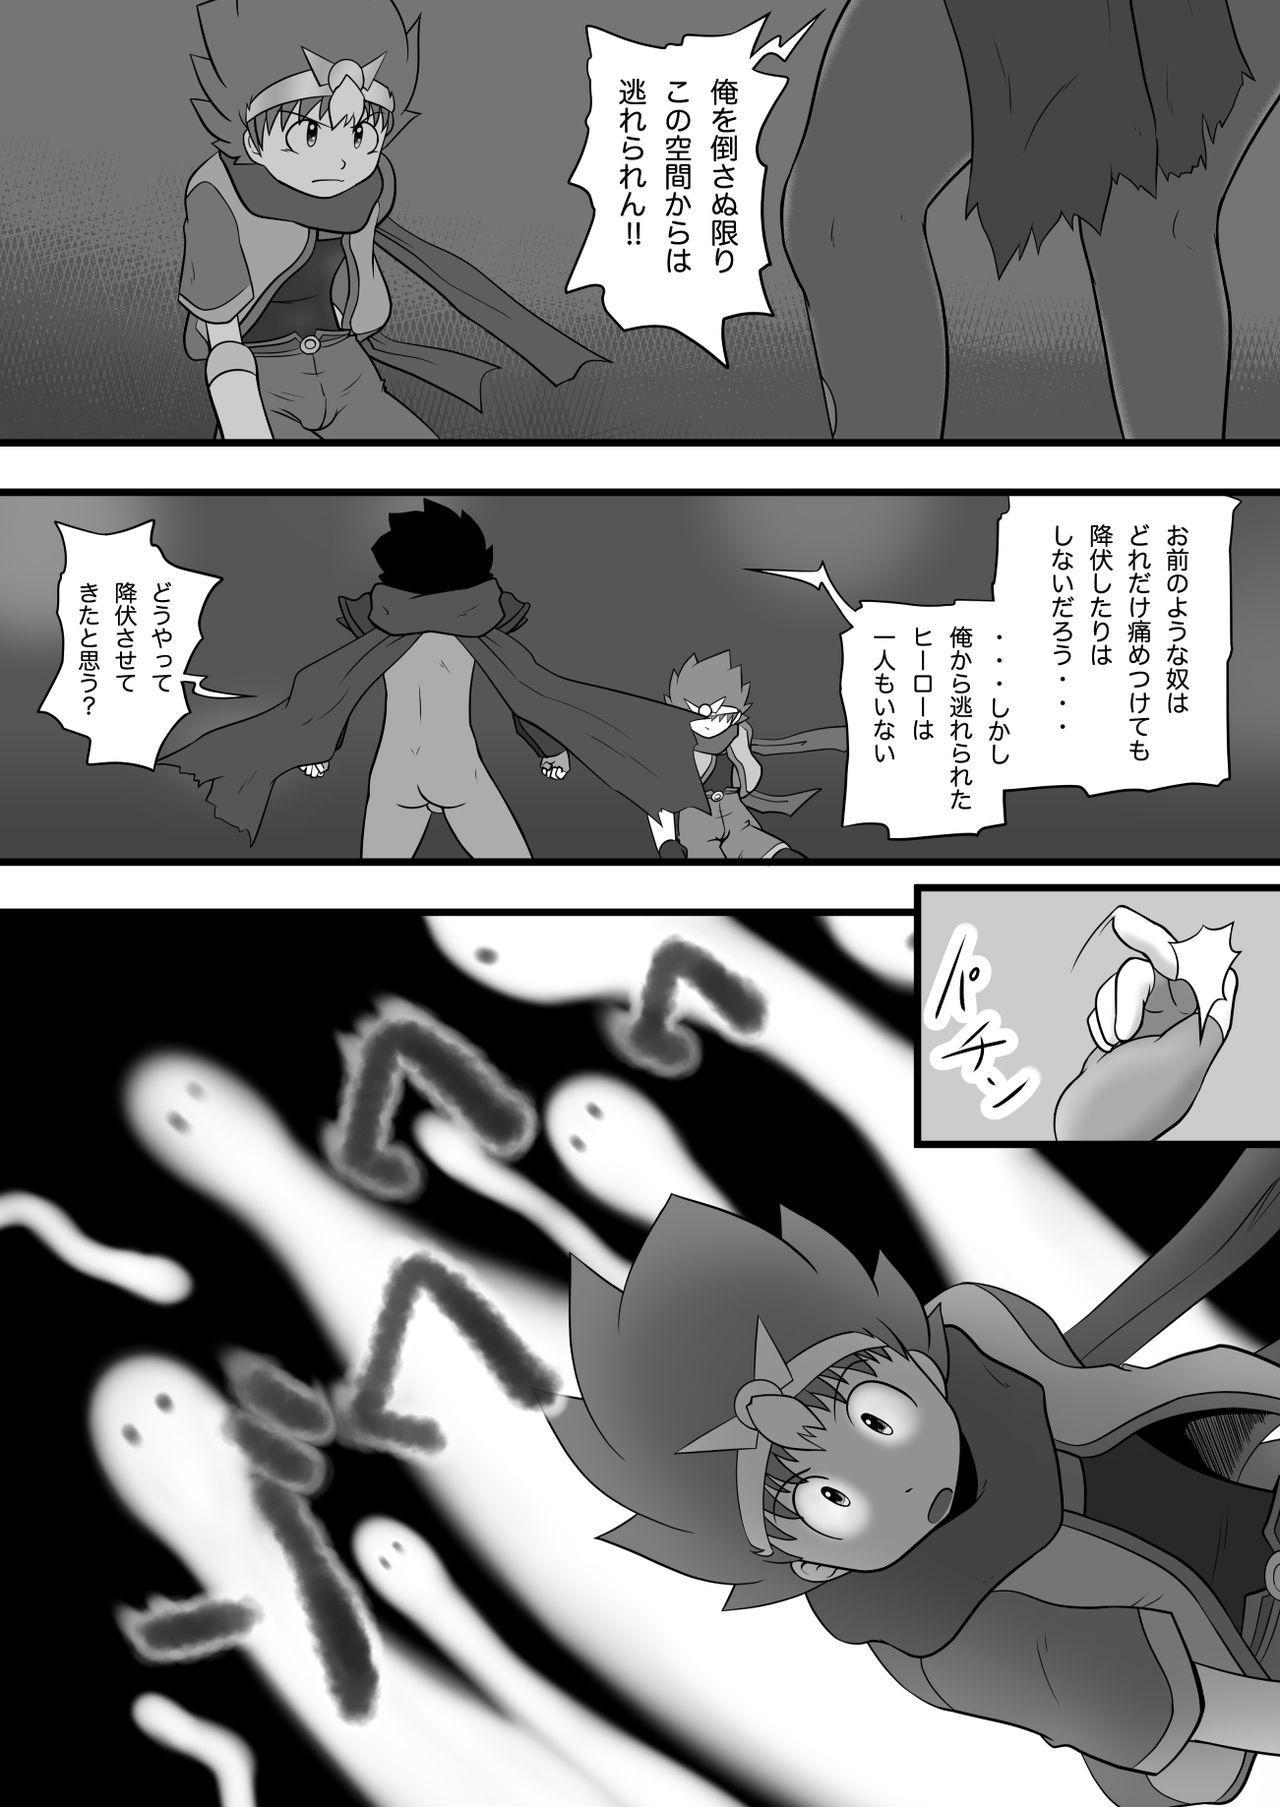 Chrono Kid TSURUGI VS Enboy 15